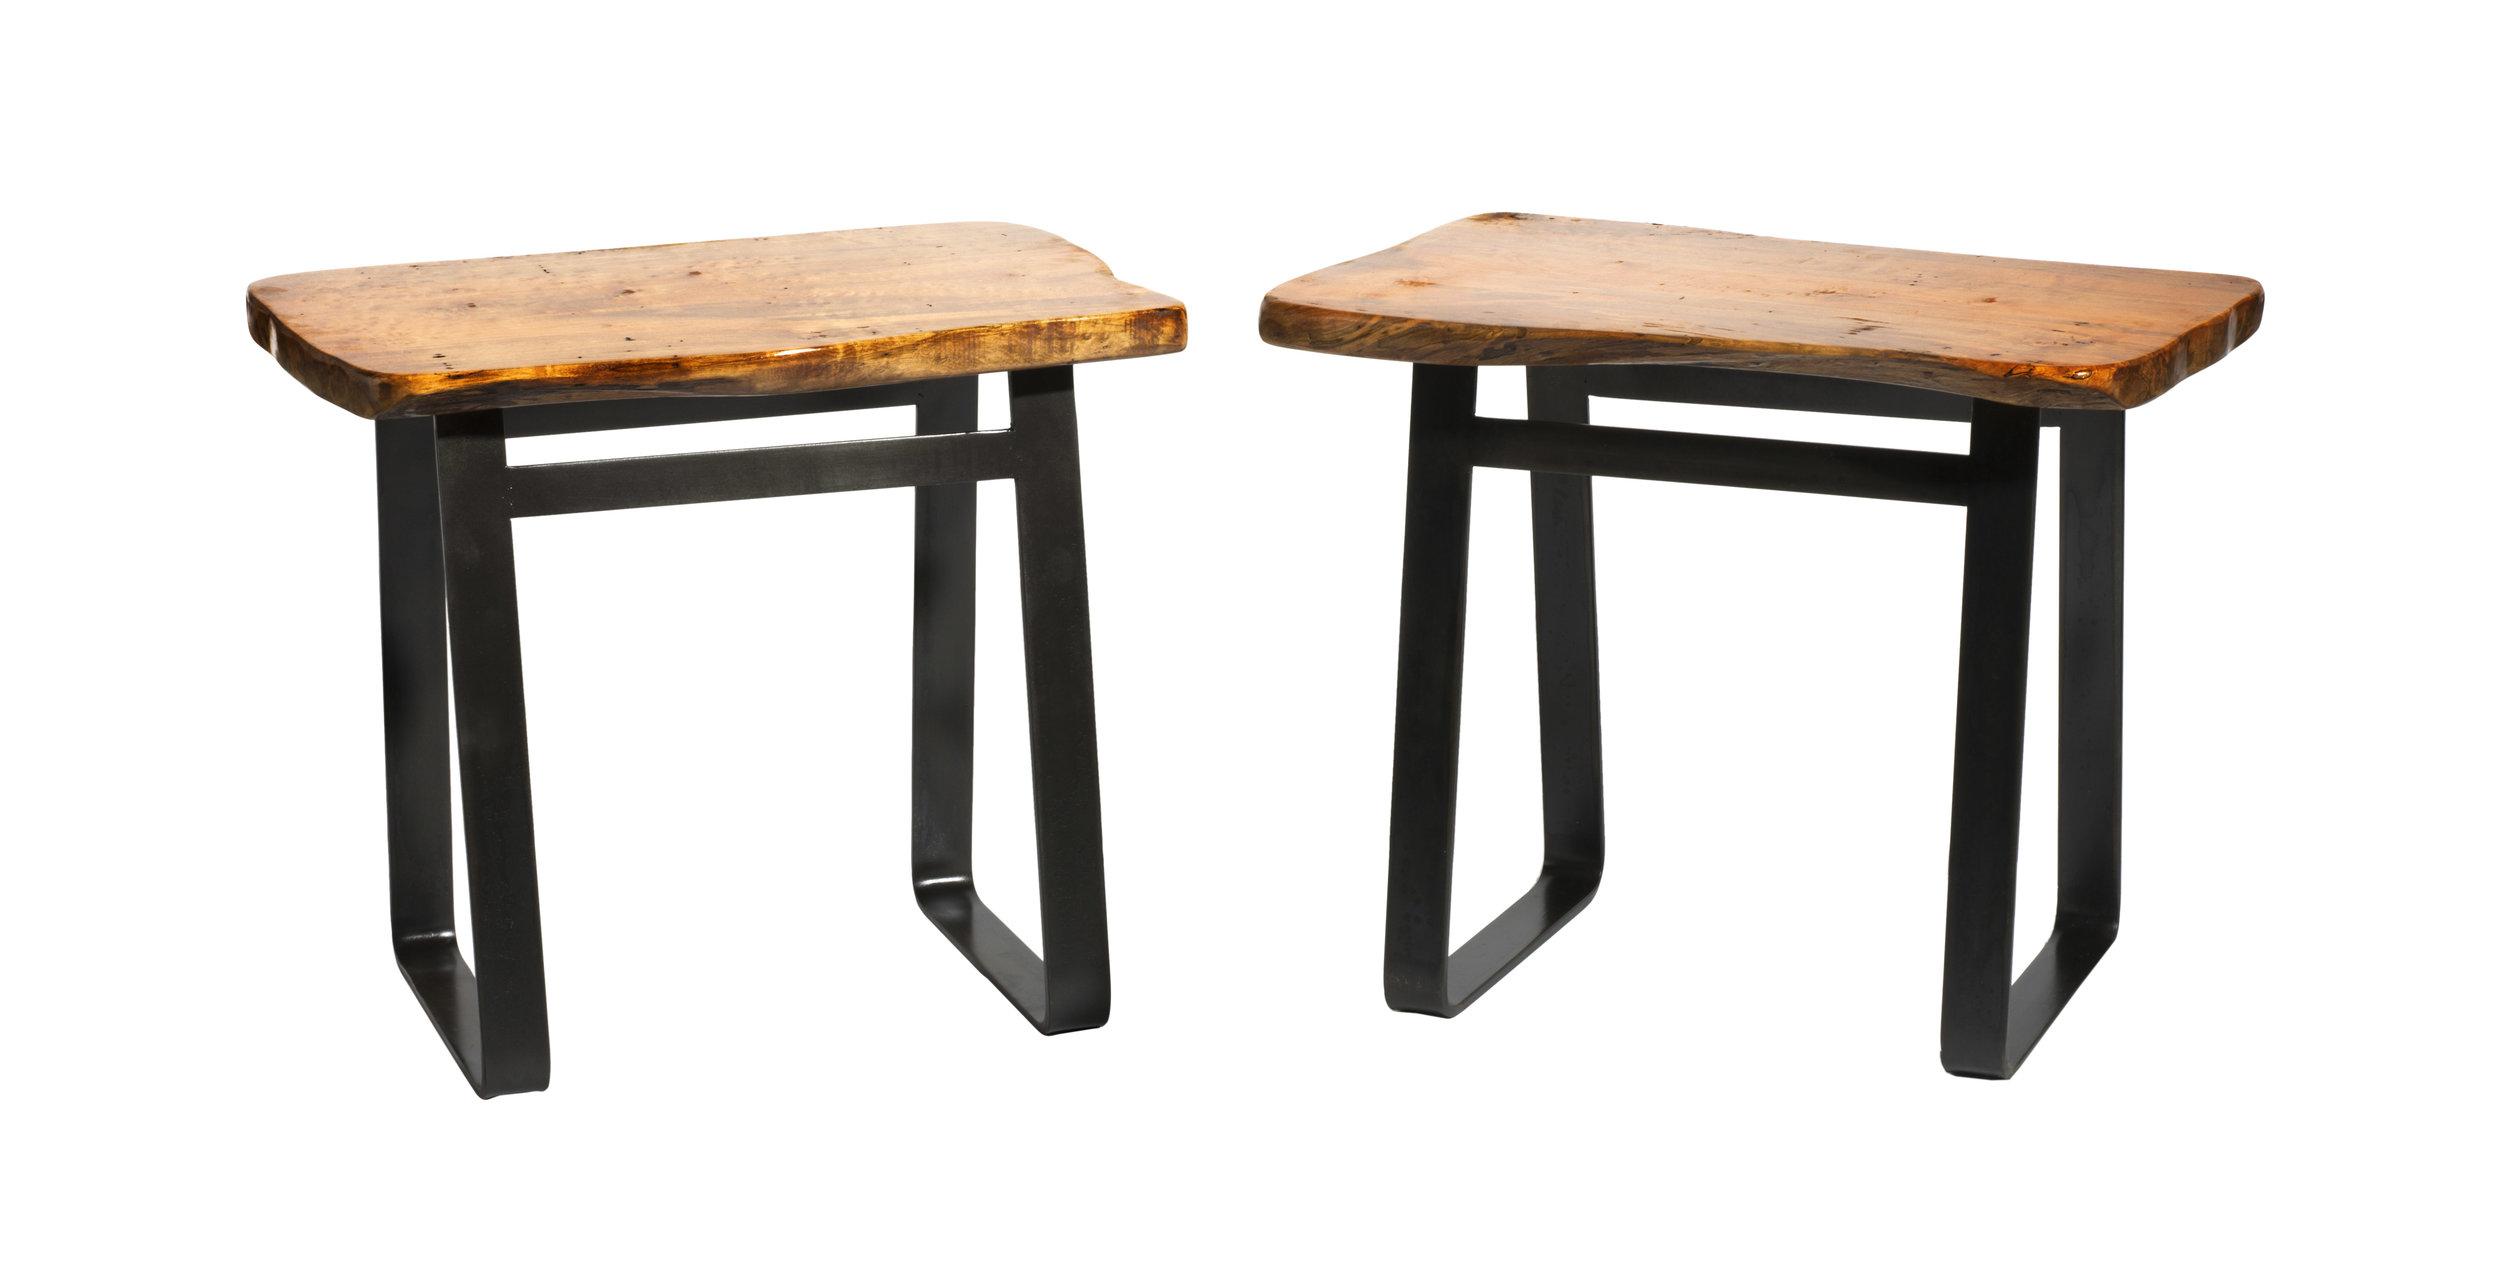 hess end table pair_1.jpg